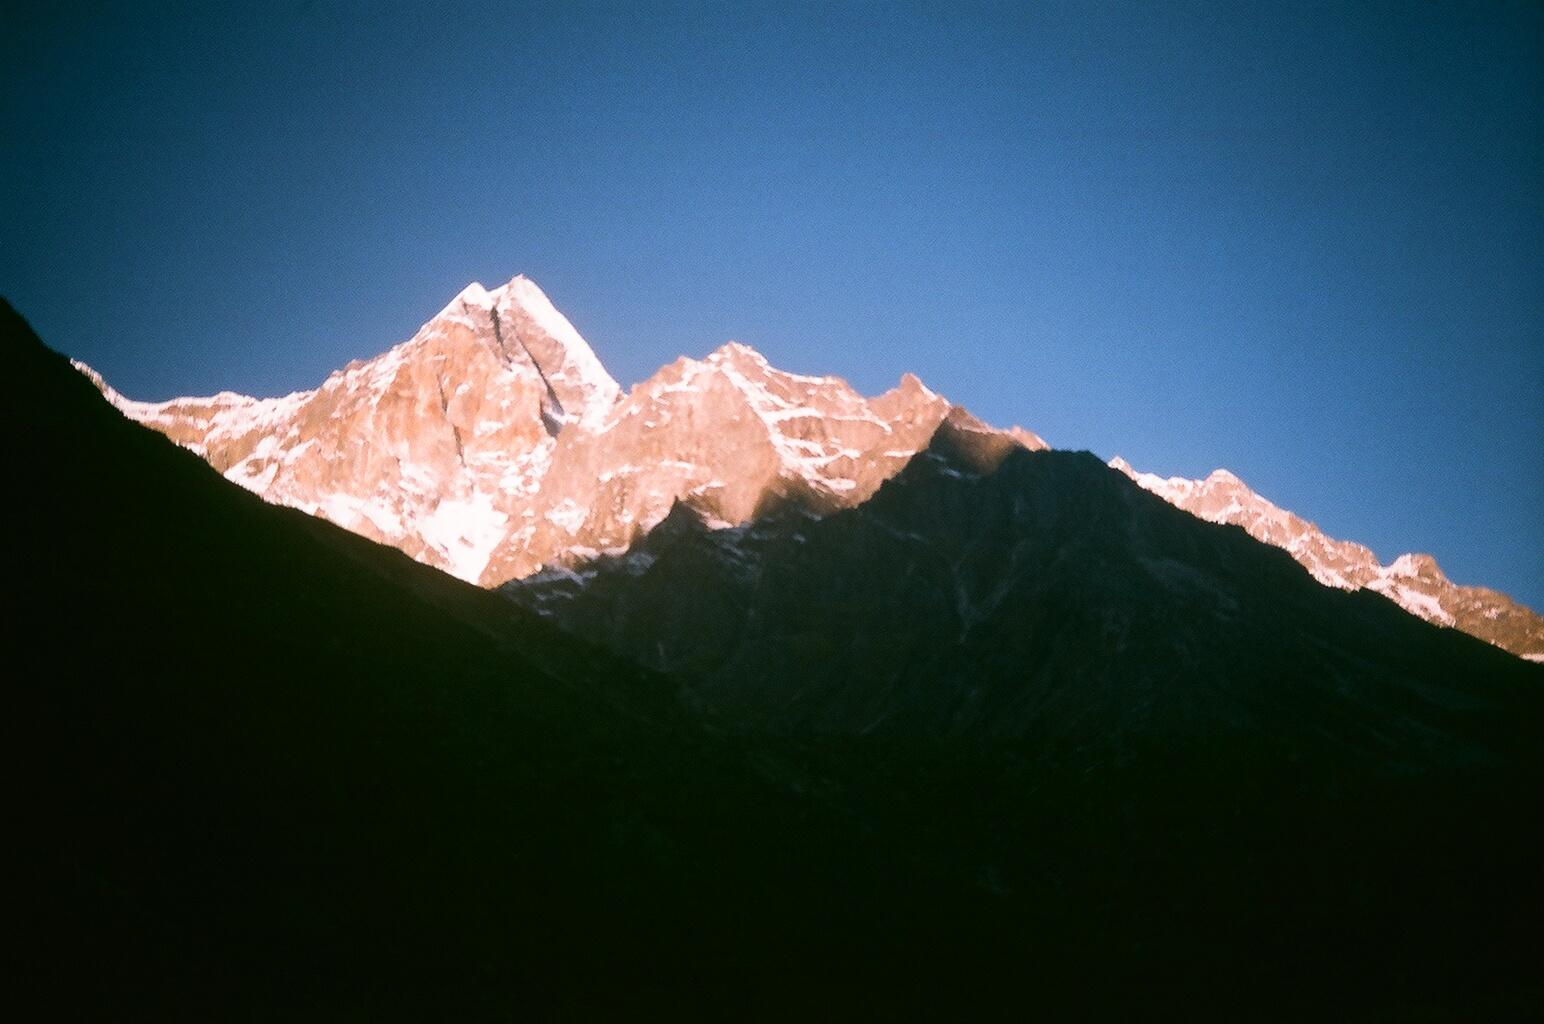 Meru peak as viewed from Bhujbasa (Garhwal Himalayas) ©  Soumit ban (   CC BY-SA 3.0   )